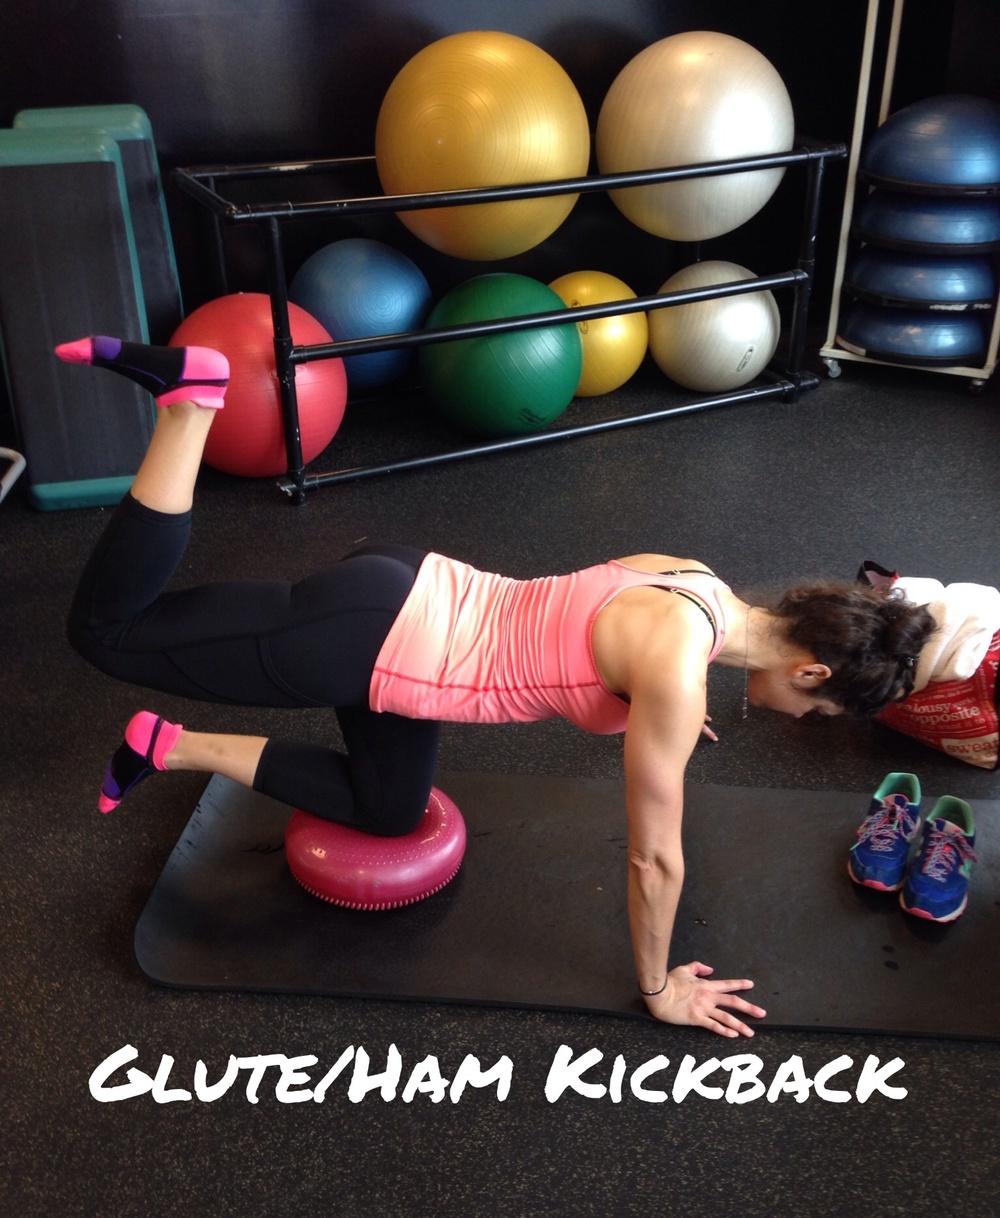 Glute/Ham Kickback